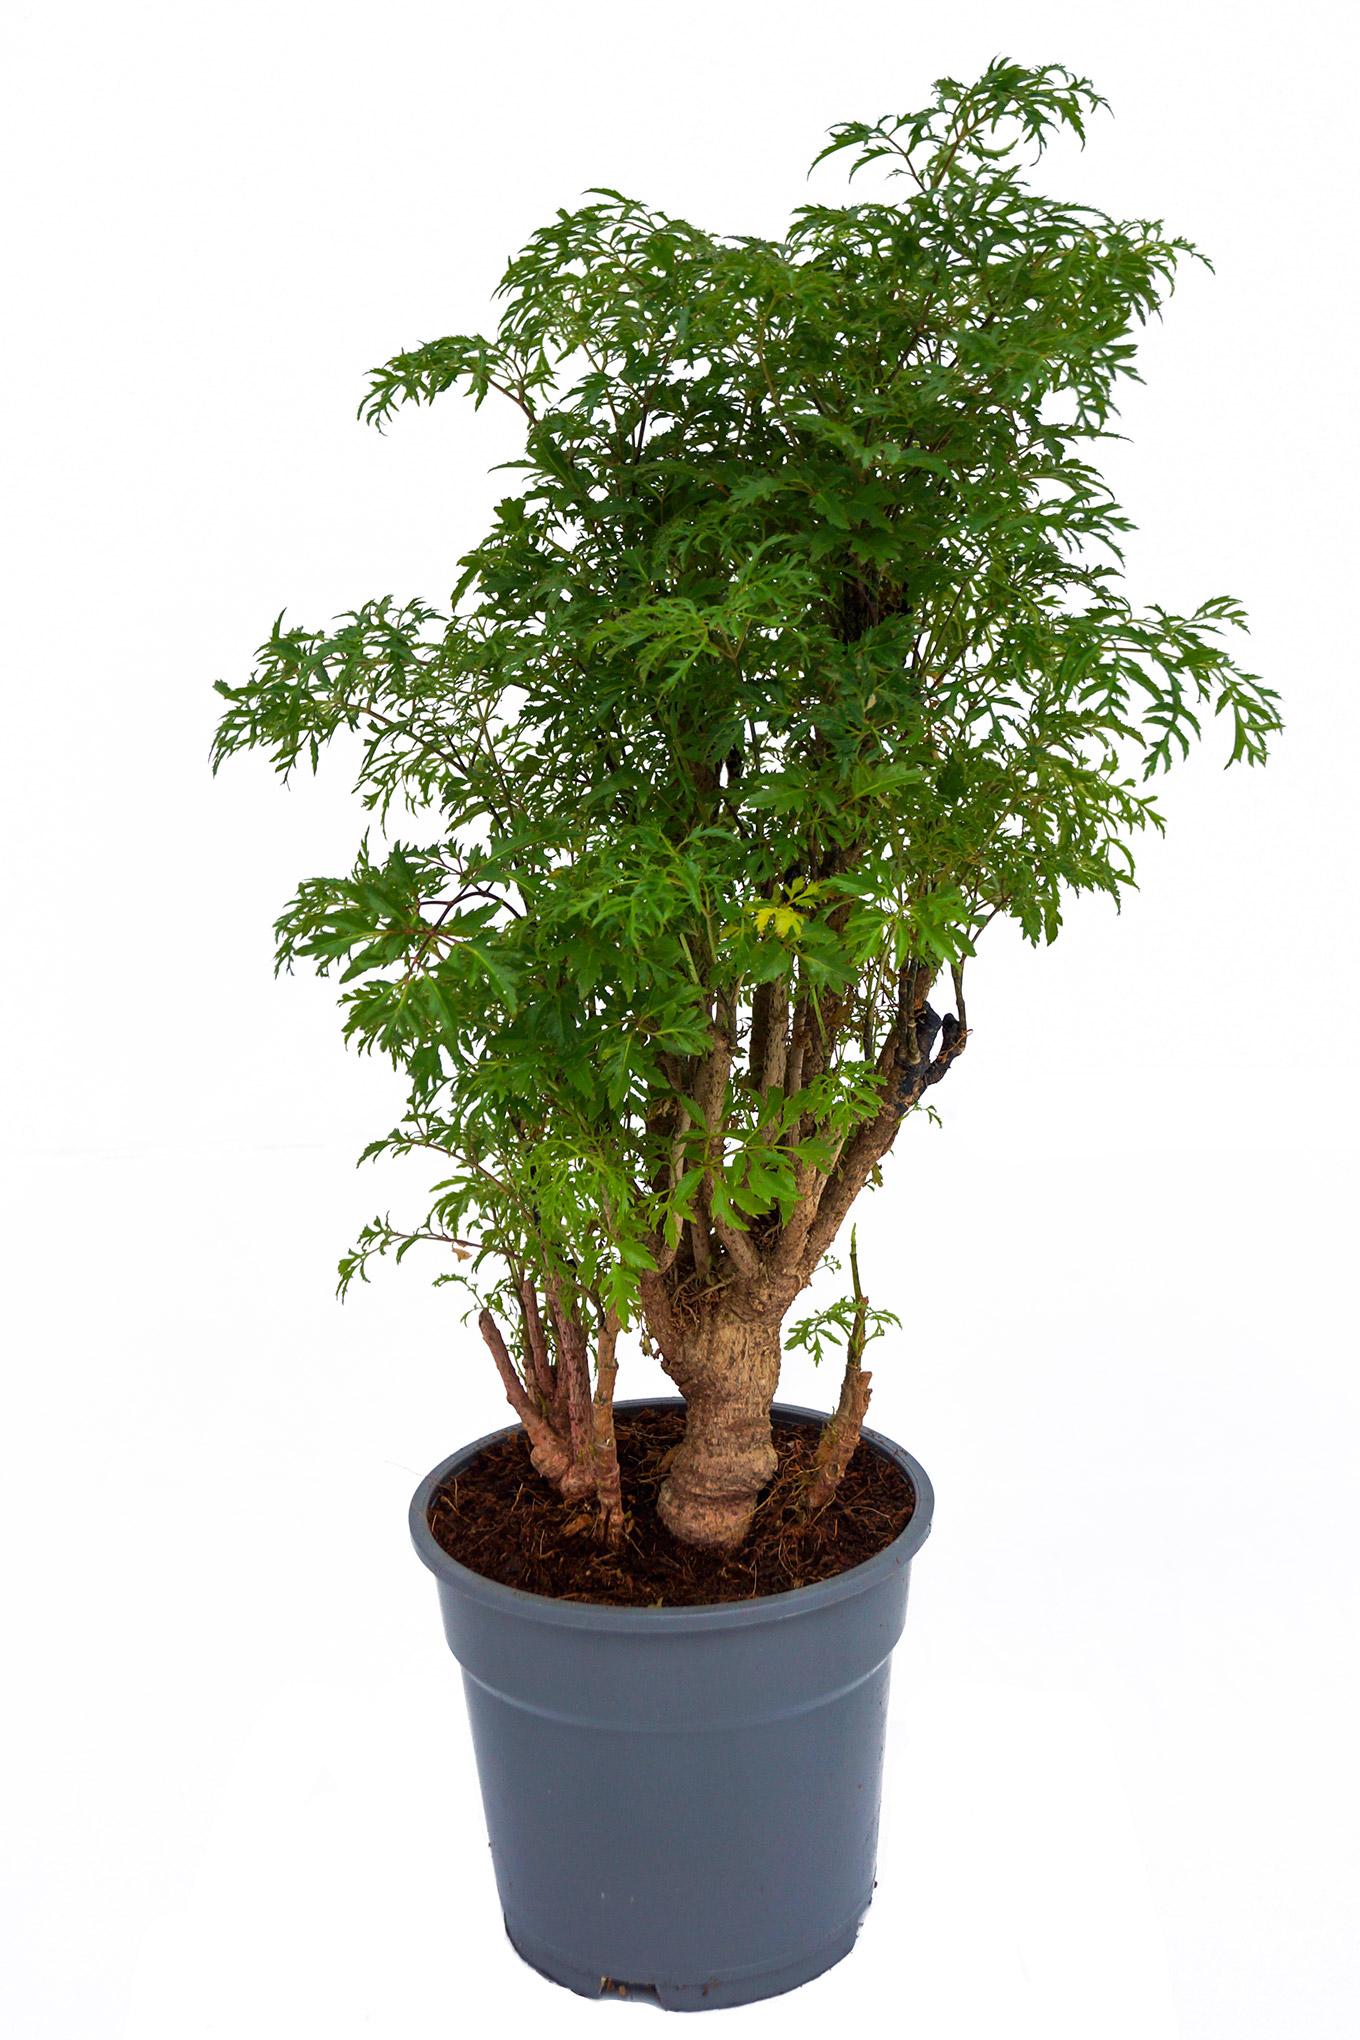 Ming Aralia - Polyscias fruticosa